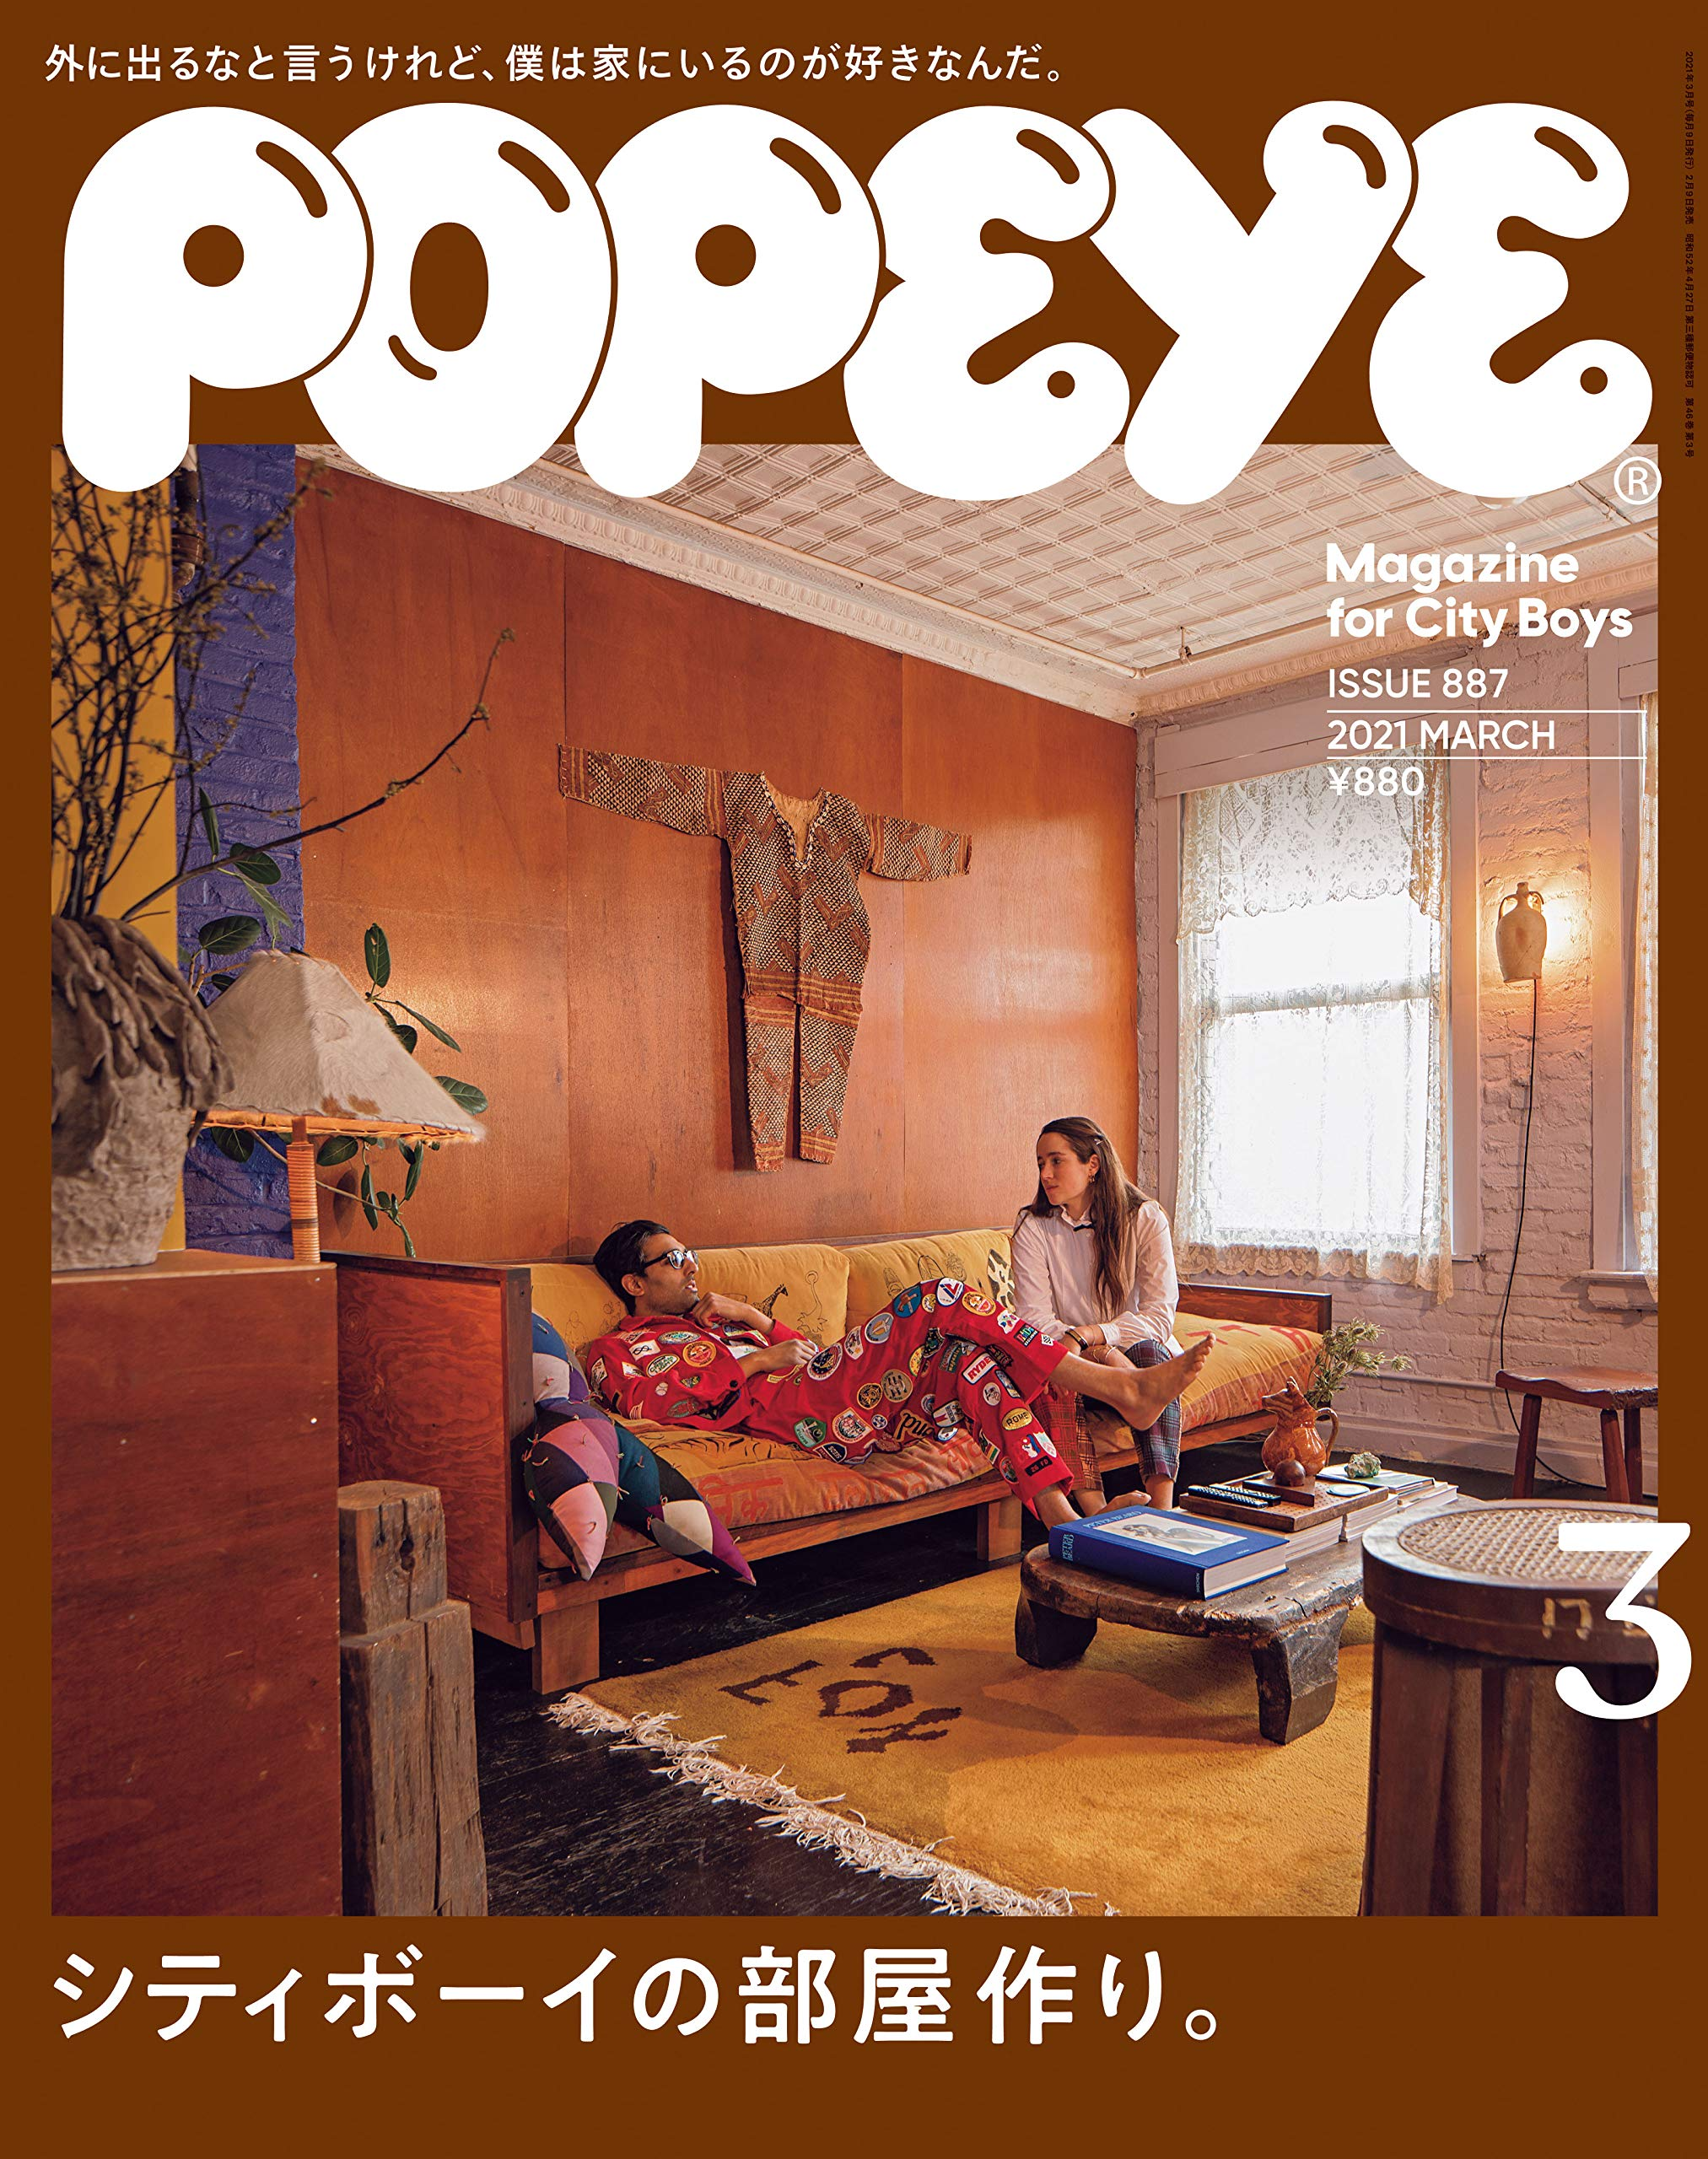 『POPEYE』2020年3月号, マガジンハウス